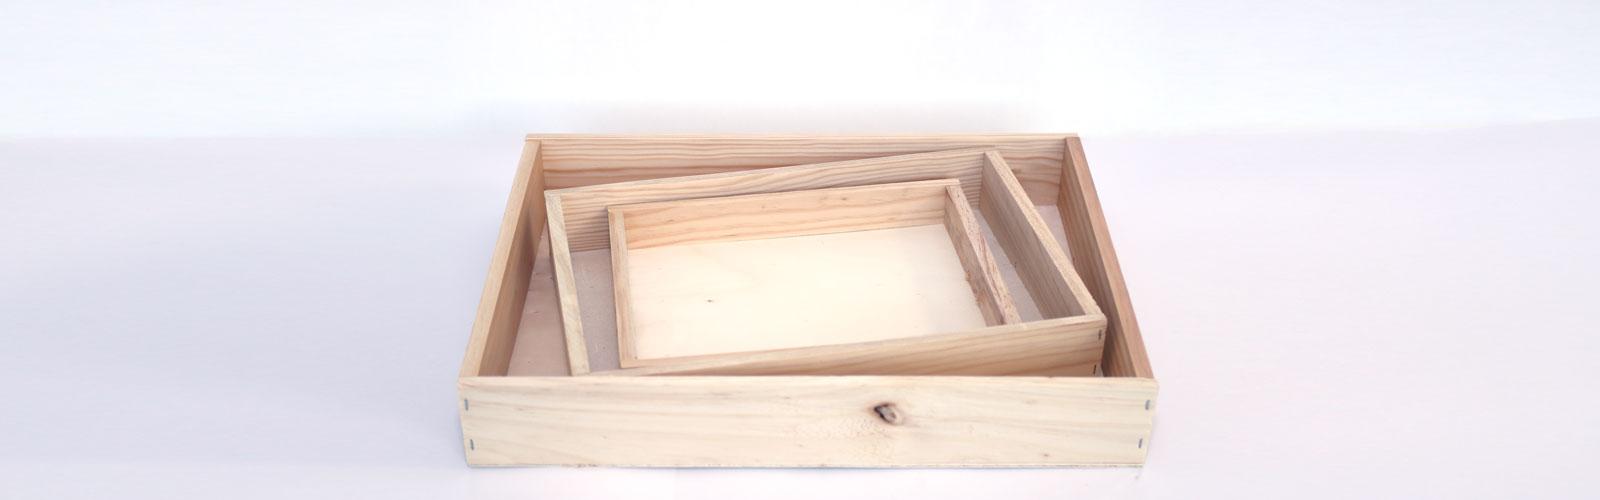 venta de cajas de madera - caja de marisco de madera